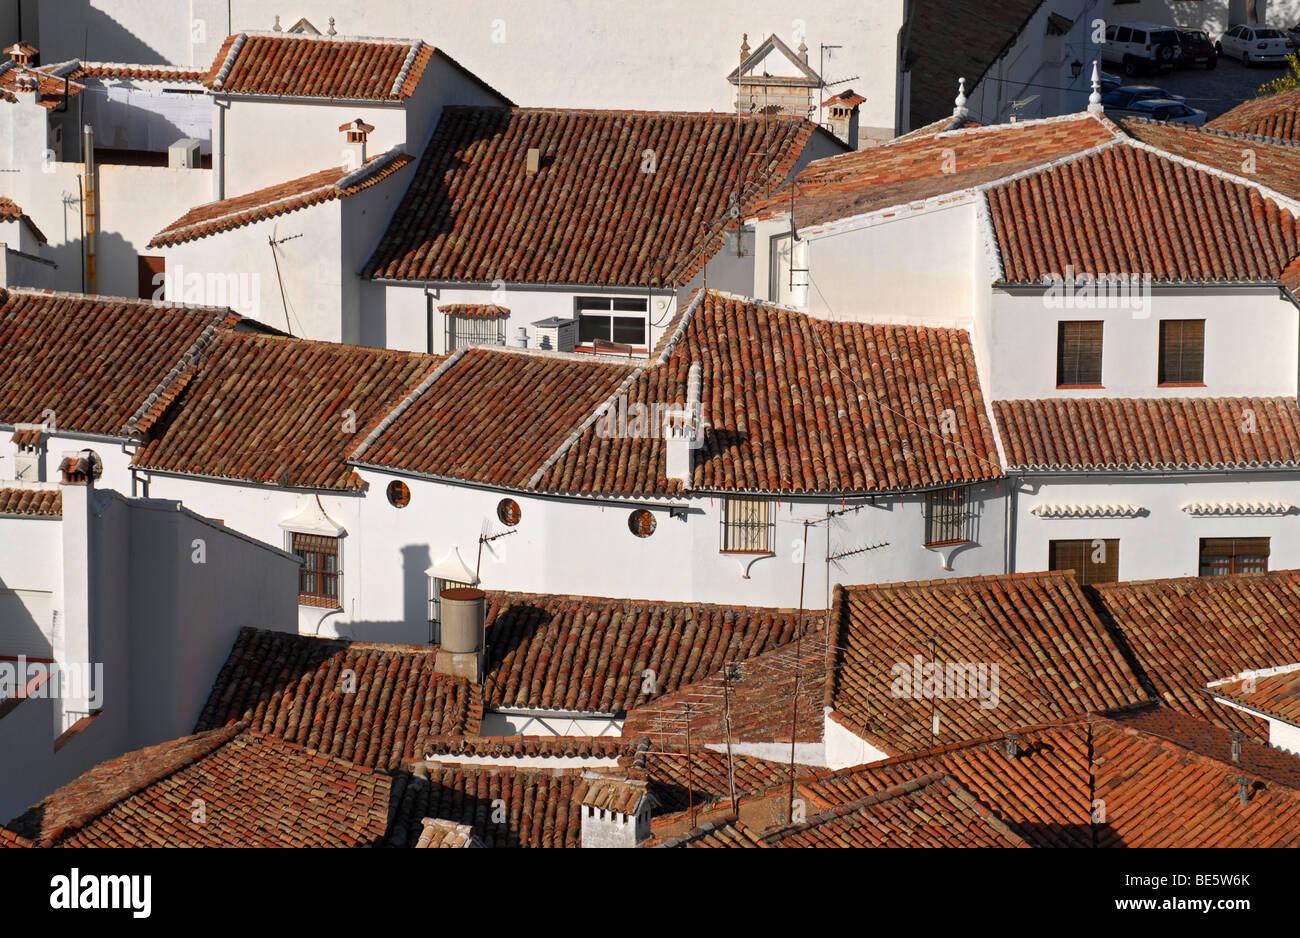 Roofs of the village of Grazalema, a Pueblo Blanco, white village, in the Sierra de Grazalema, Andalusia, Spain, - Stock Image